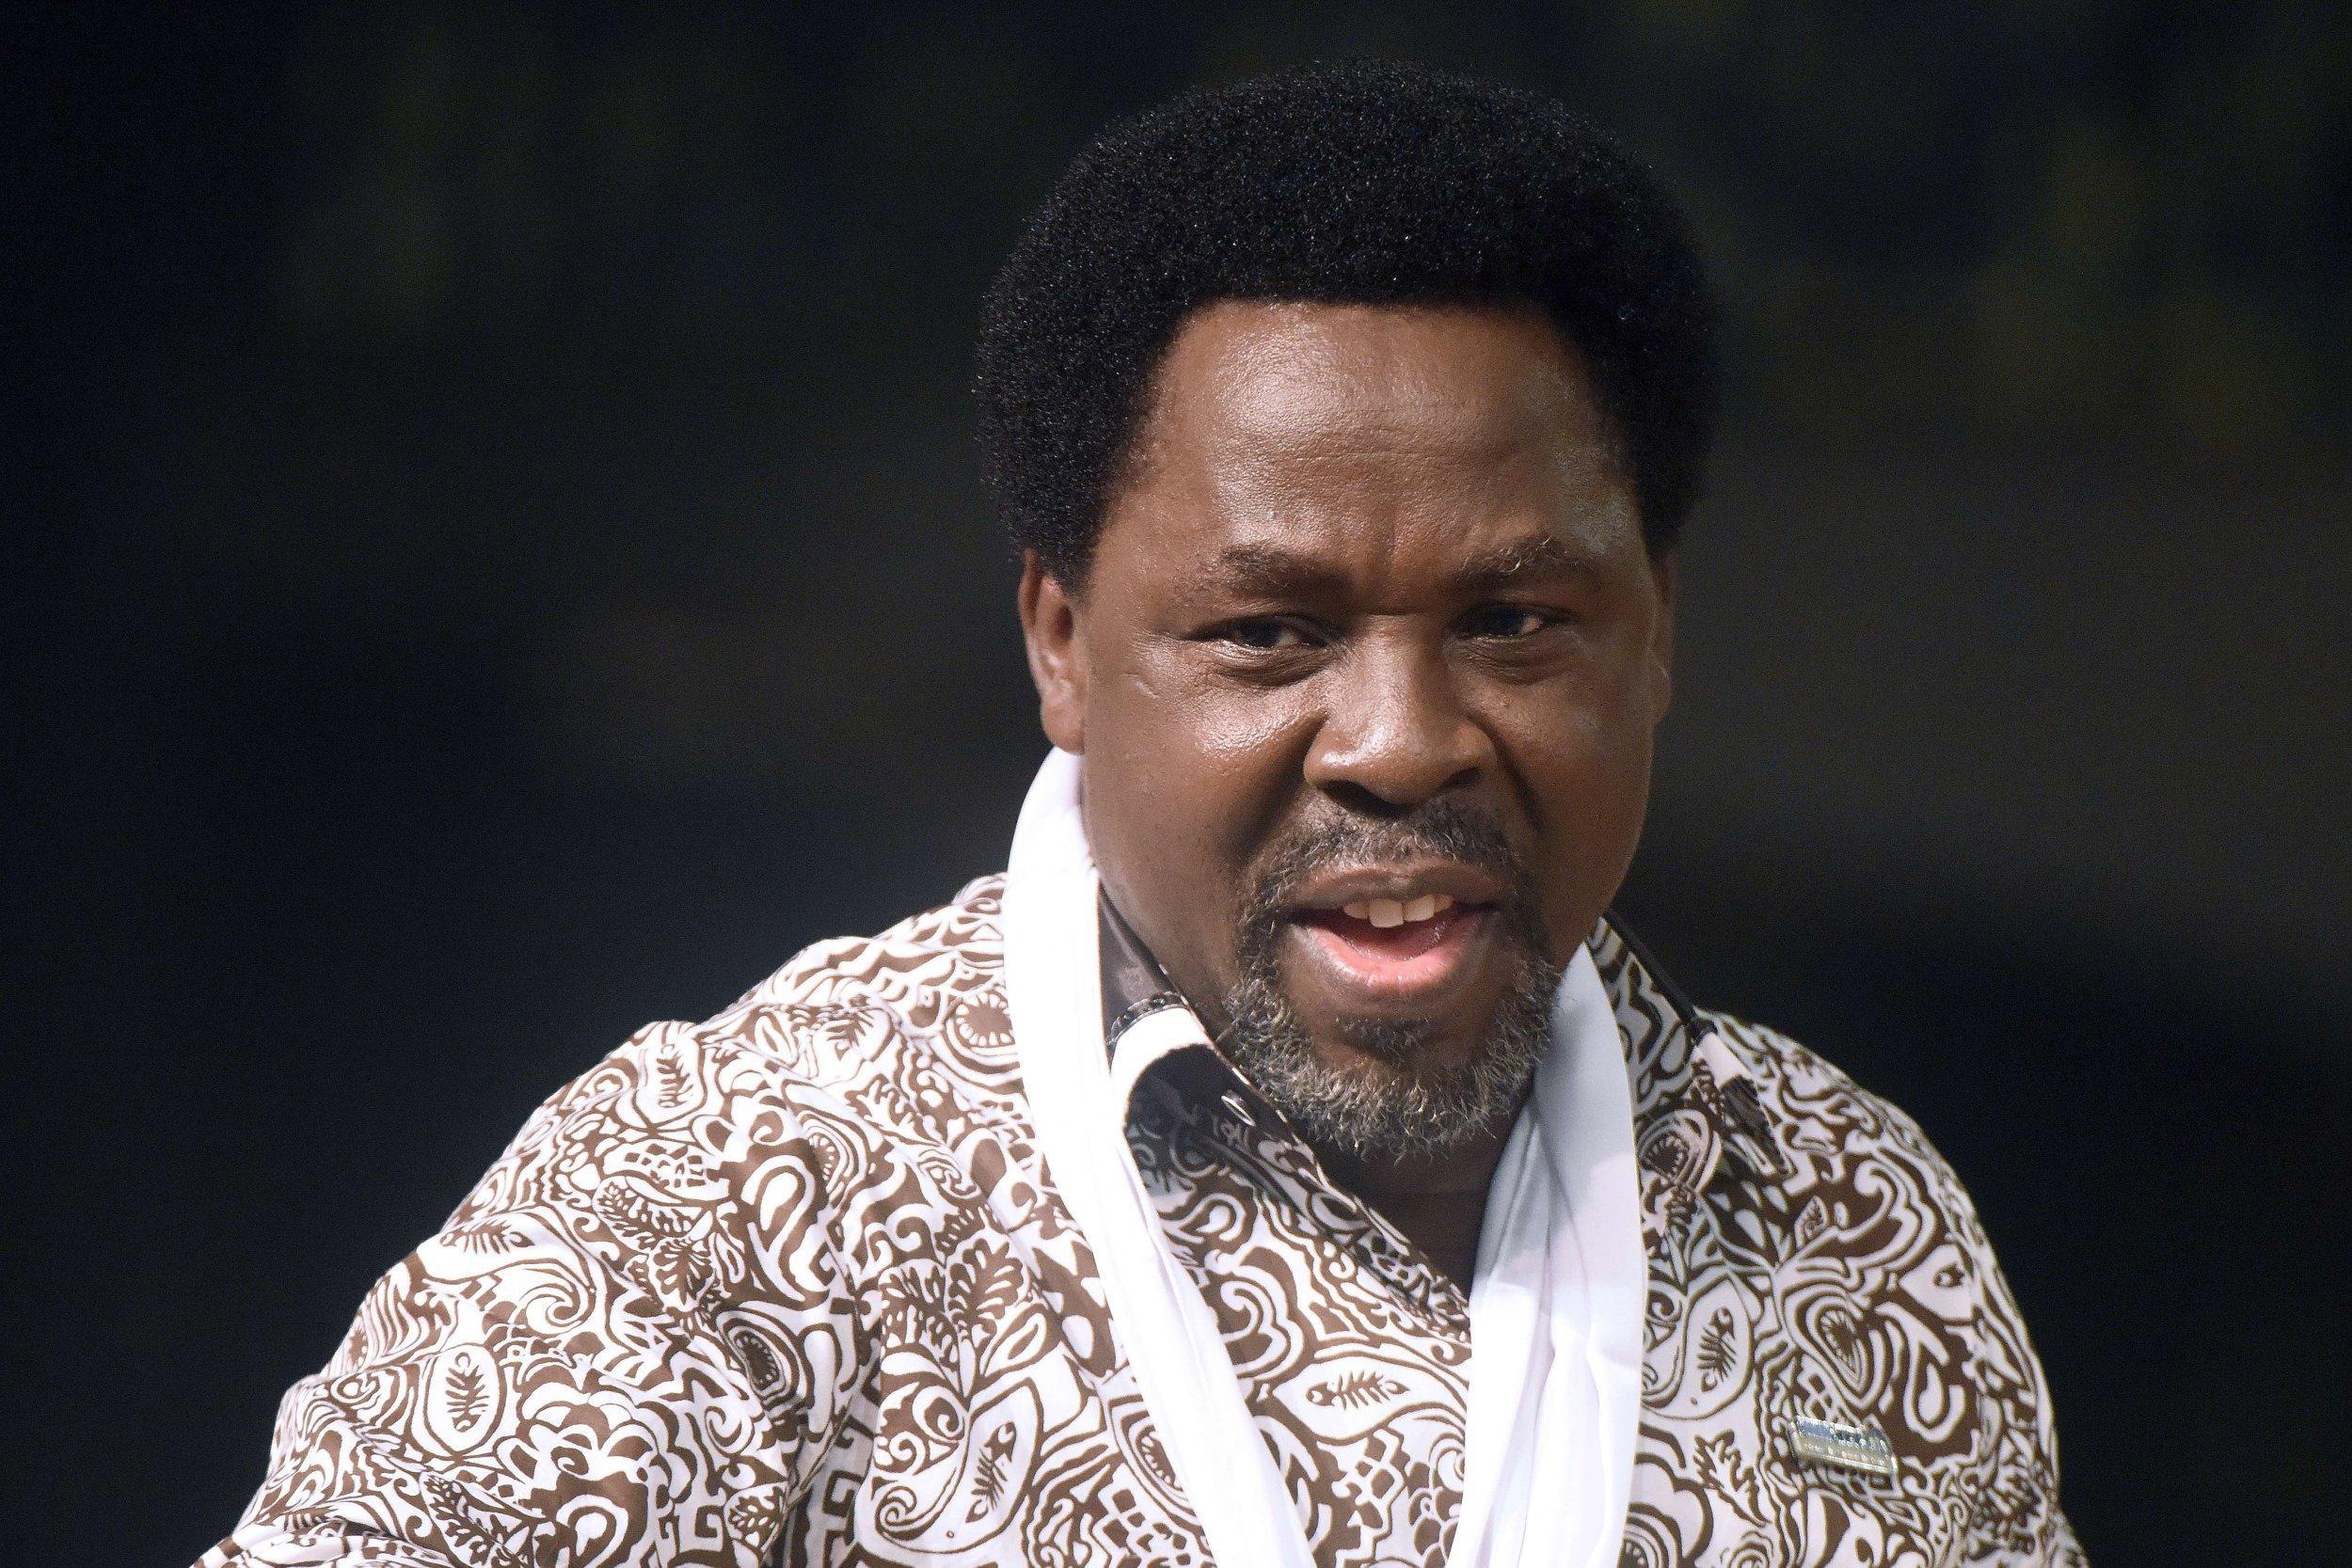 Panama Papers: Nigerian Preacher TB Joshua Denies Offshore